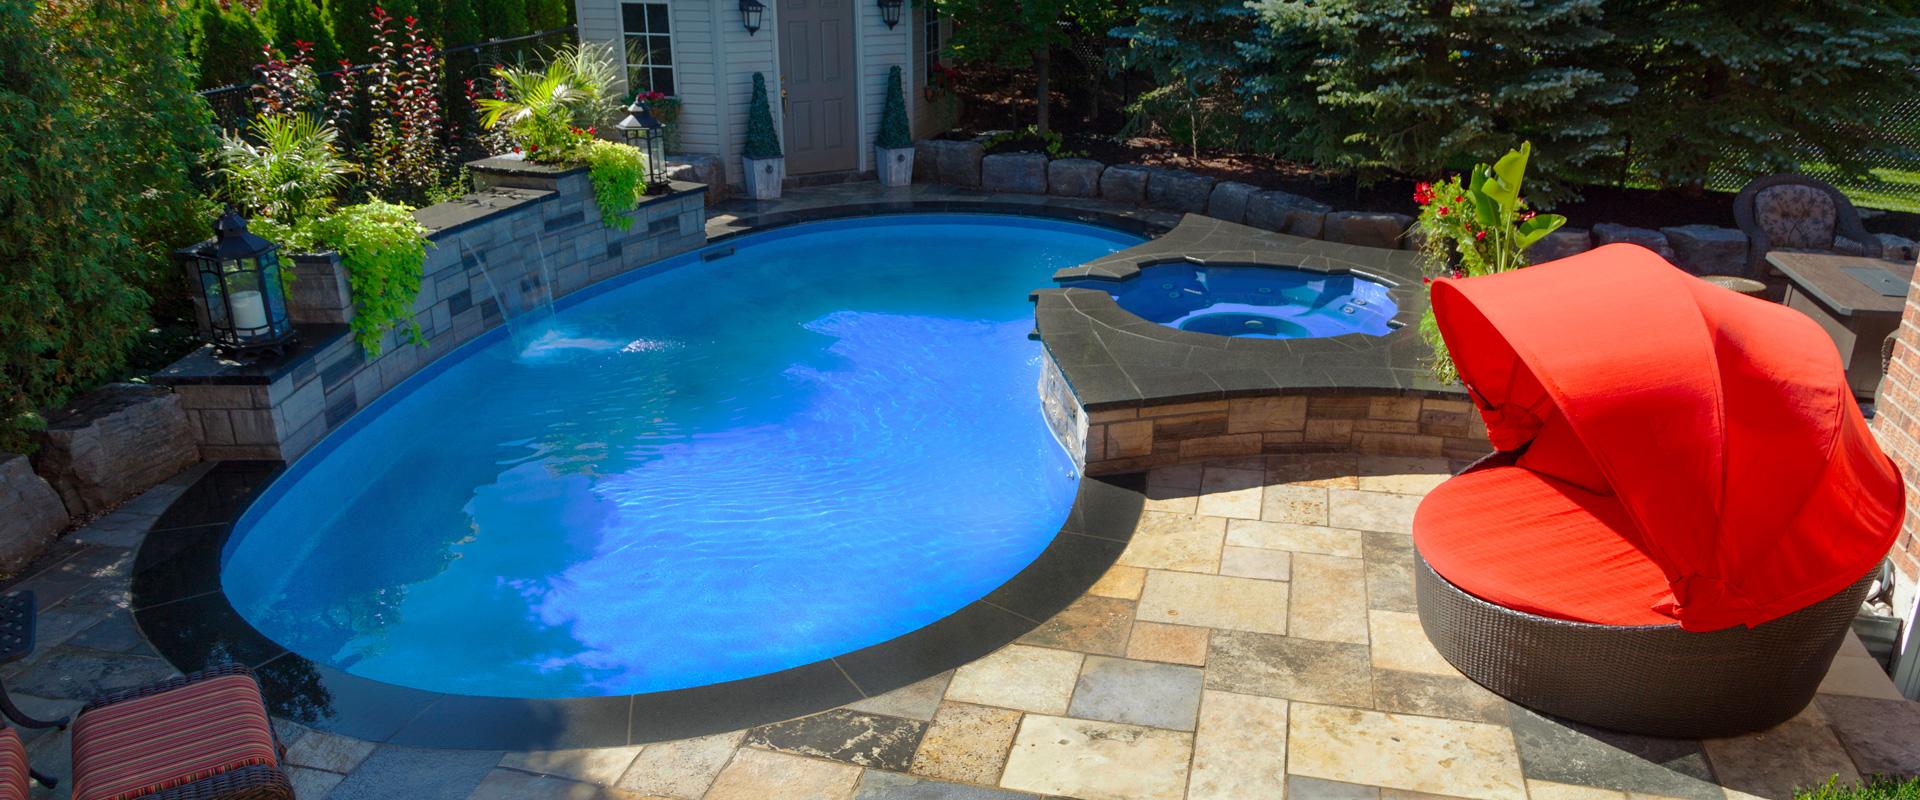 The Deiuliis Inground Pool Showcase Pioneer Family Pools